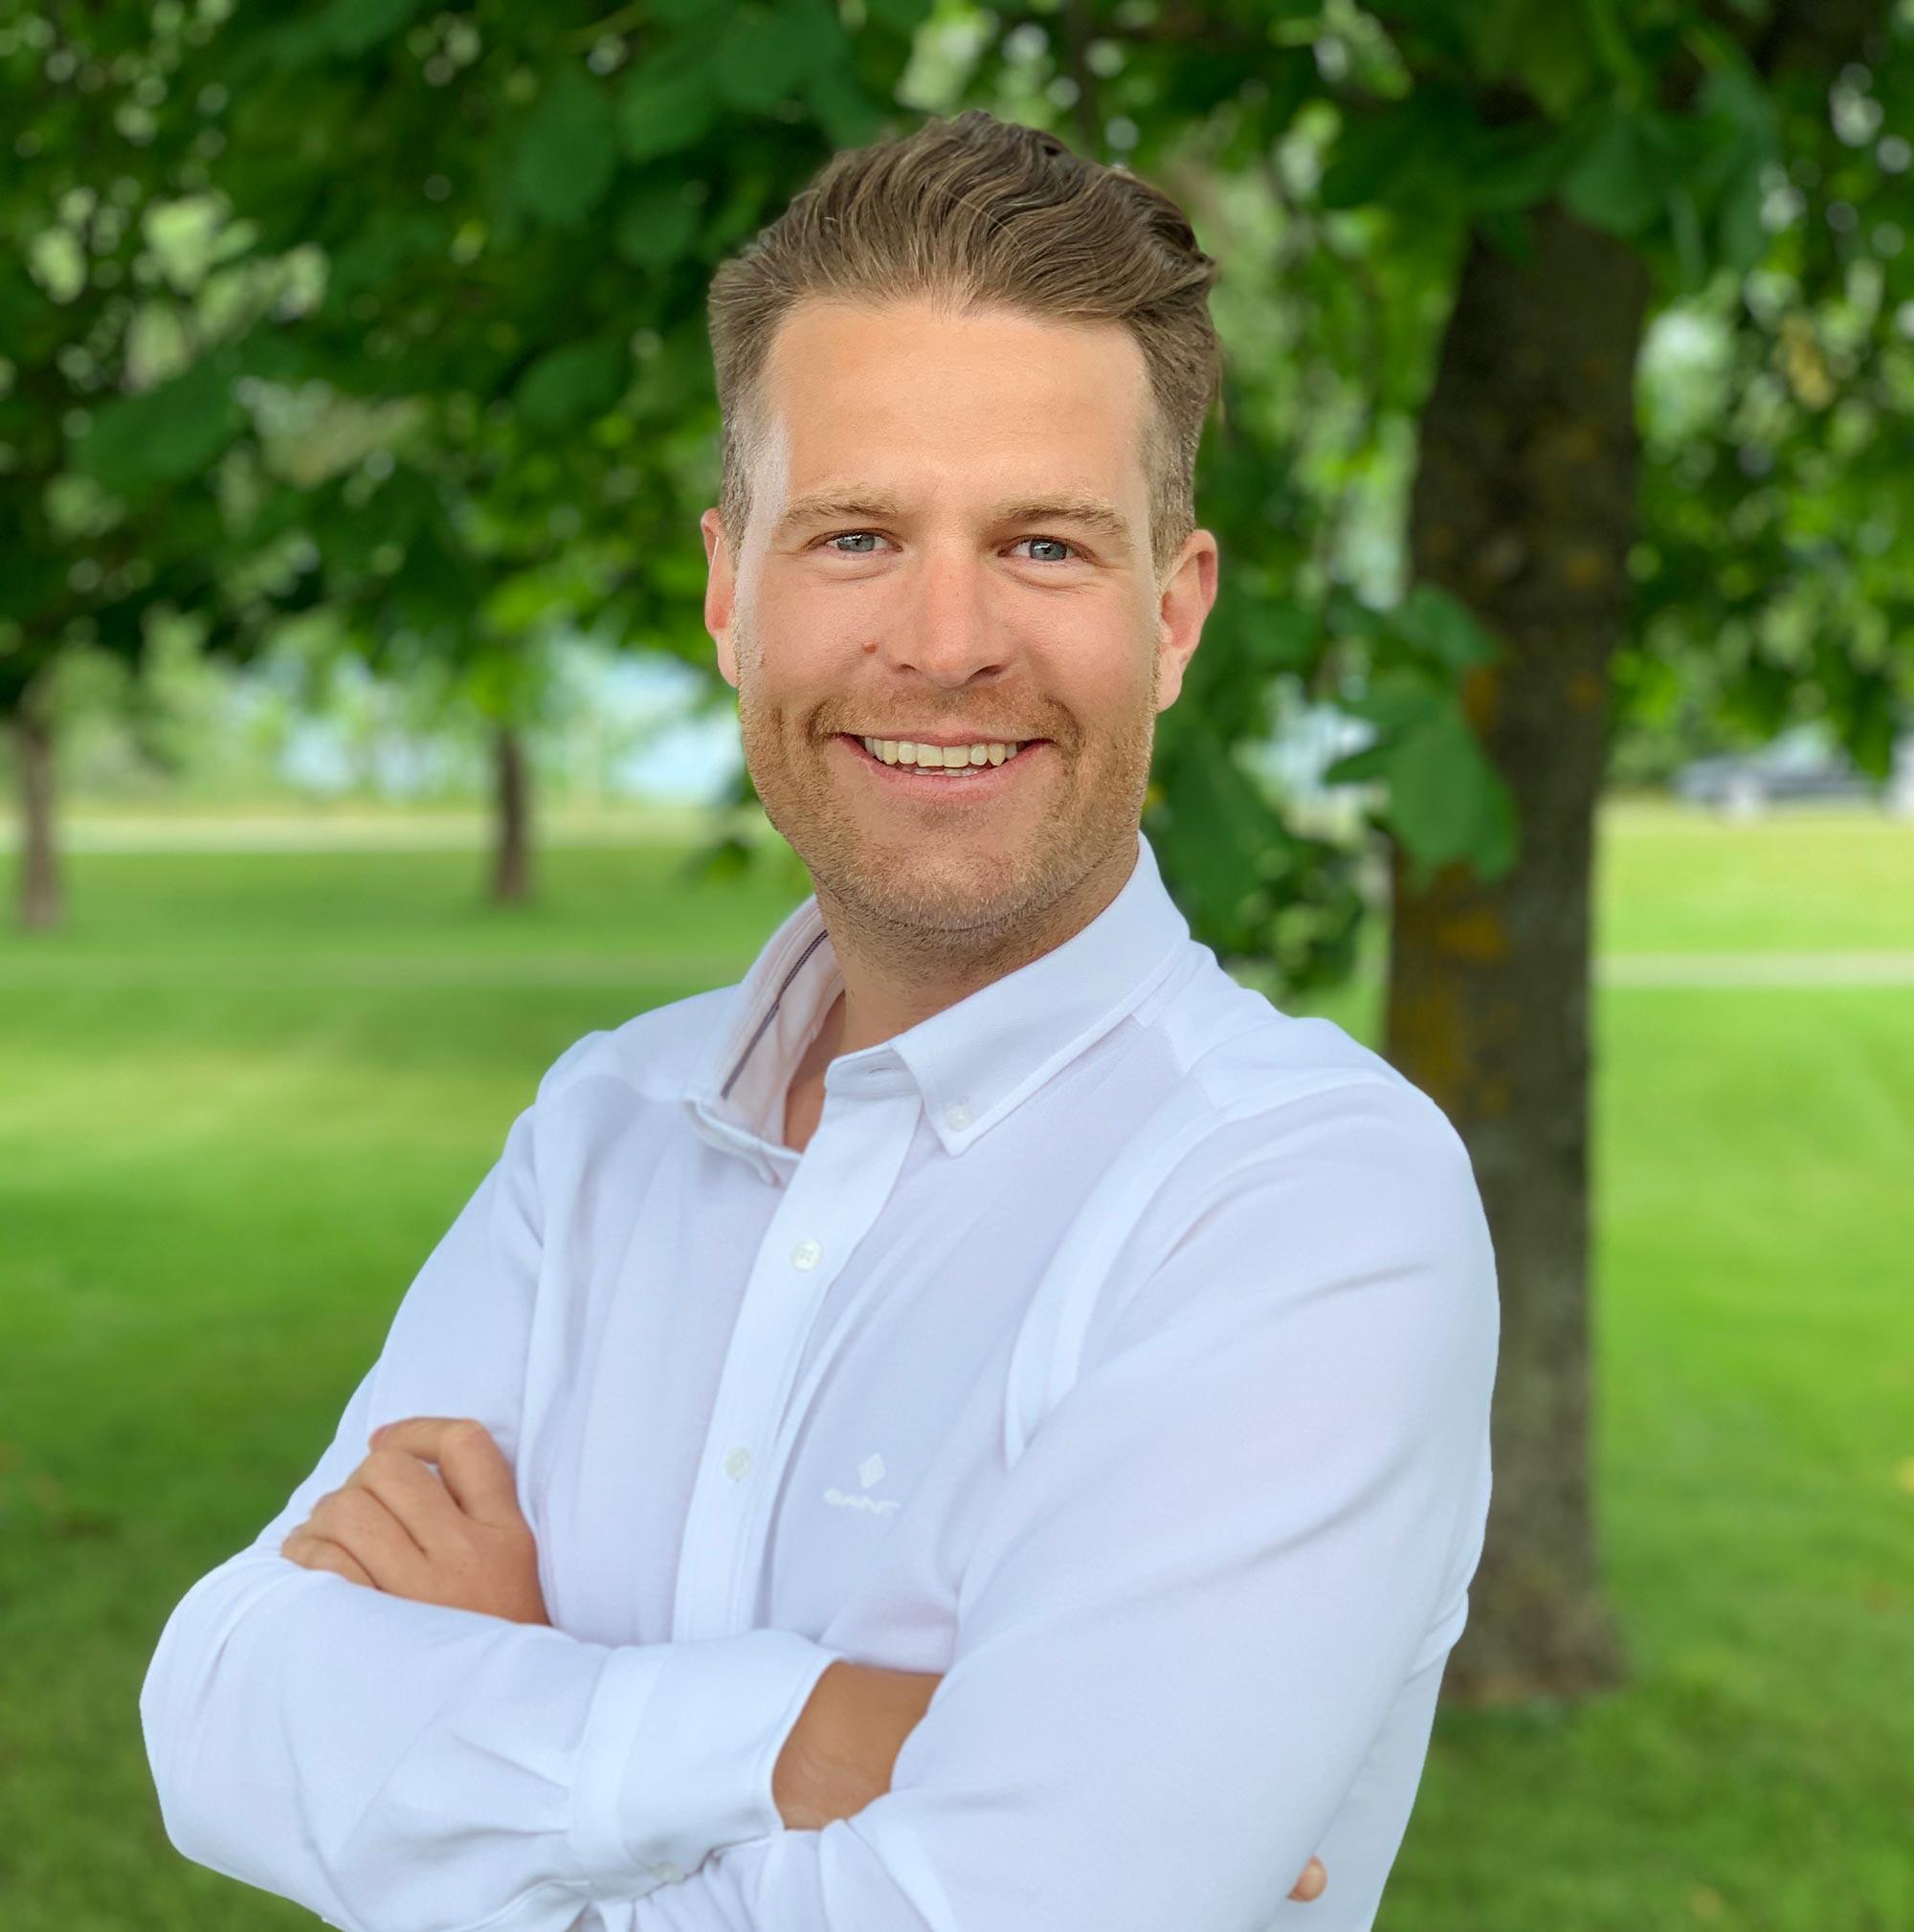 Wictor Bernersjö